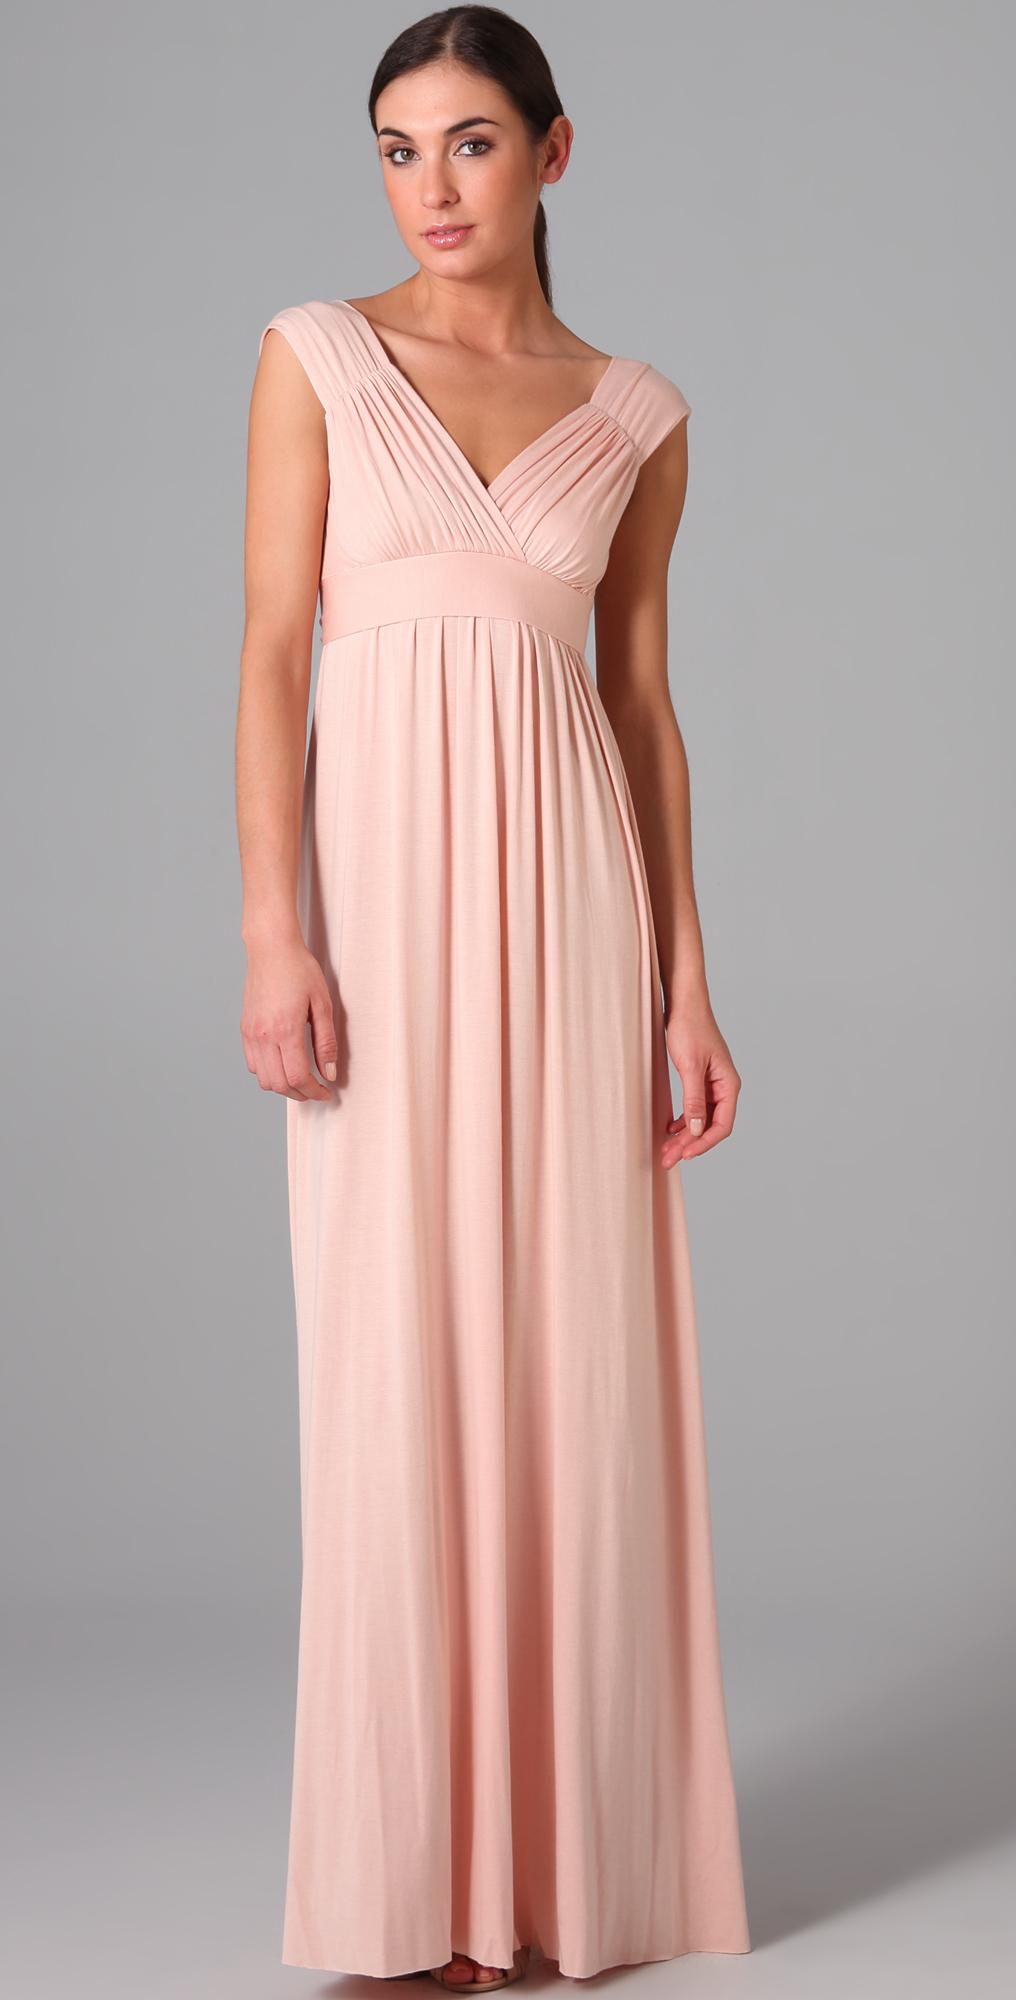 Rachel pally newport dress shopbop ombrellifo Image collections